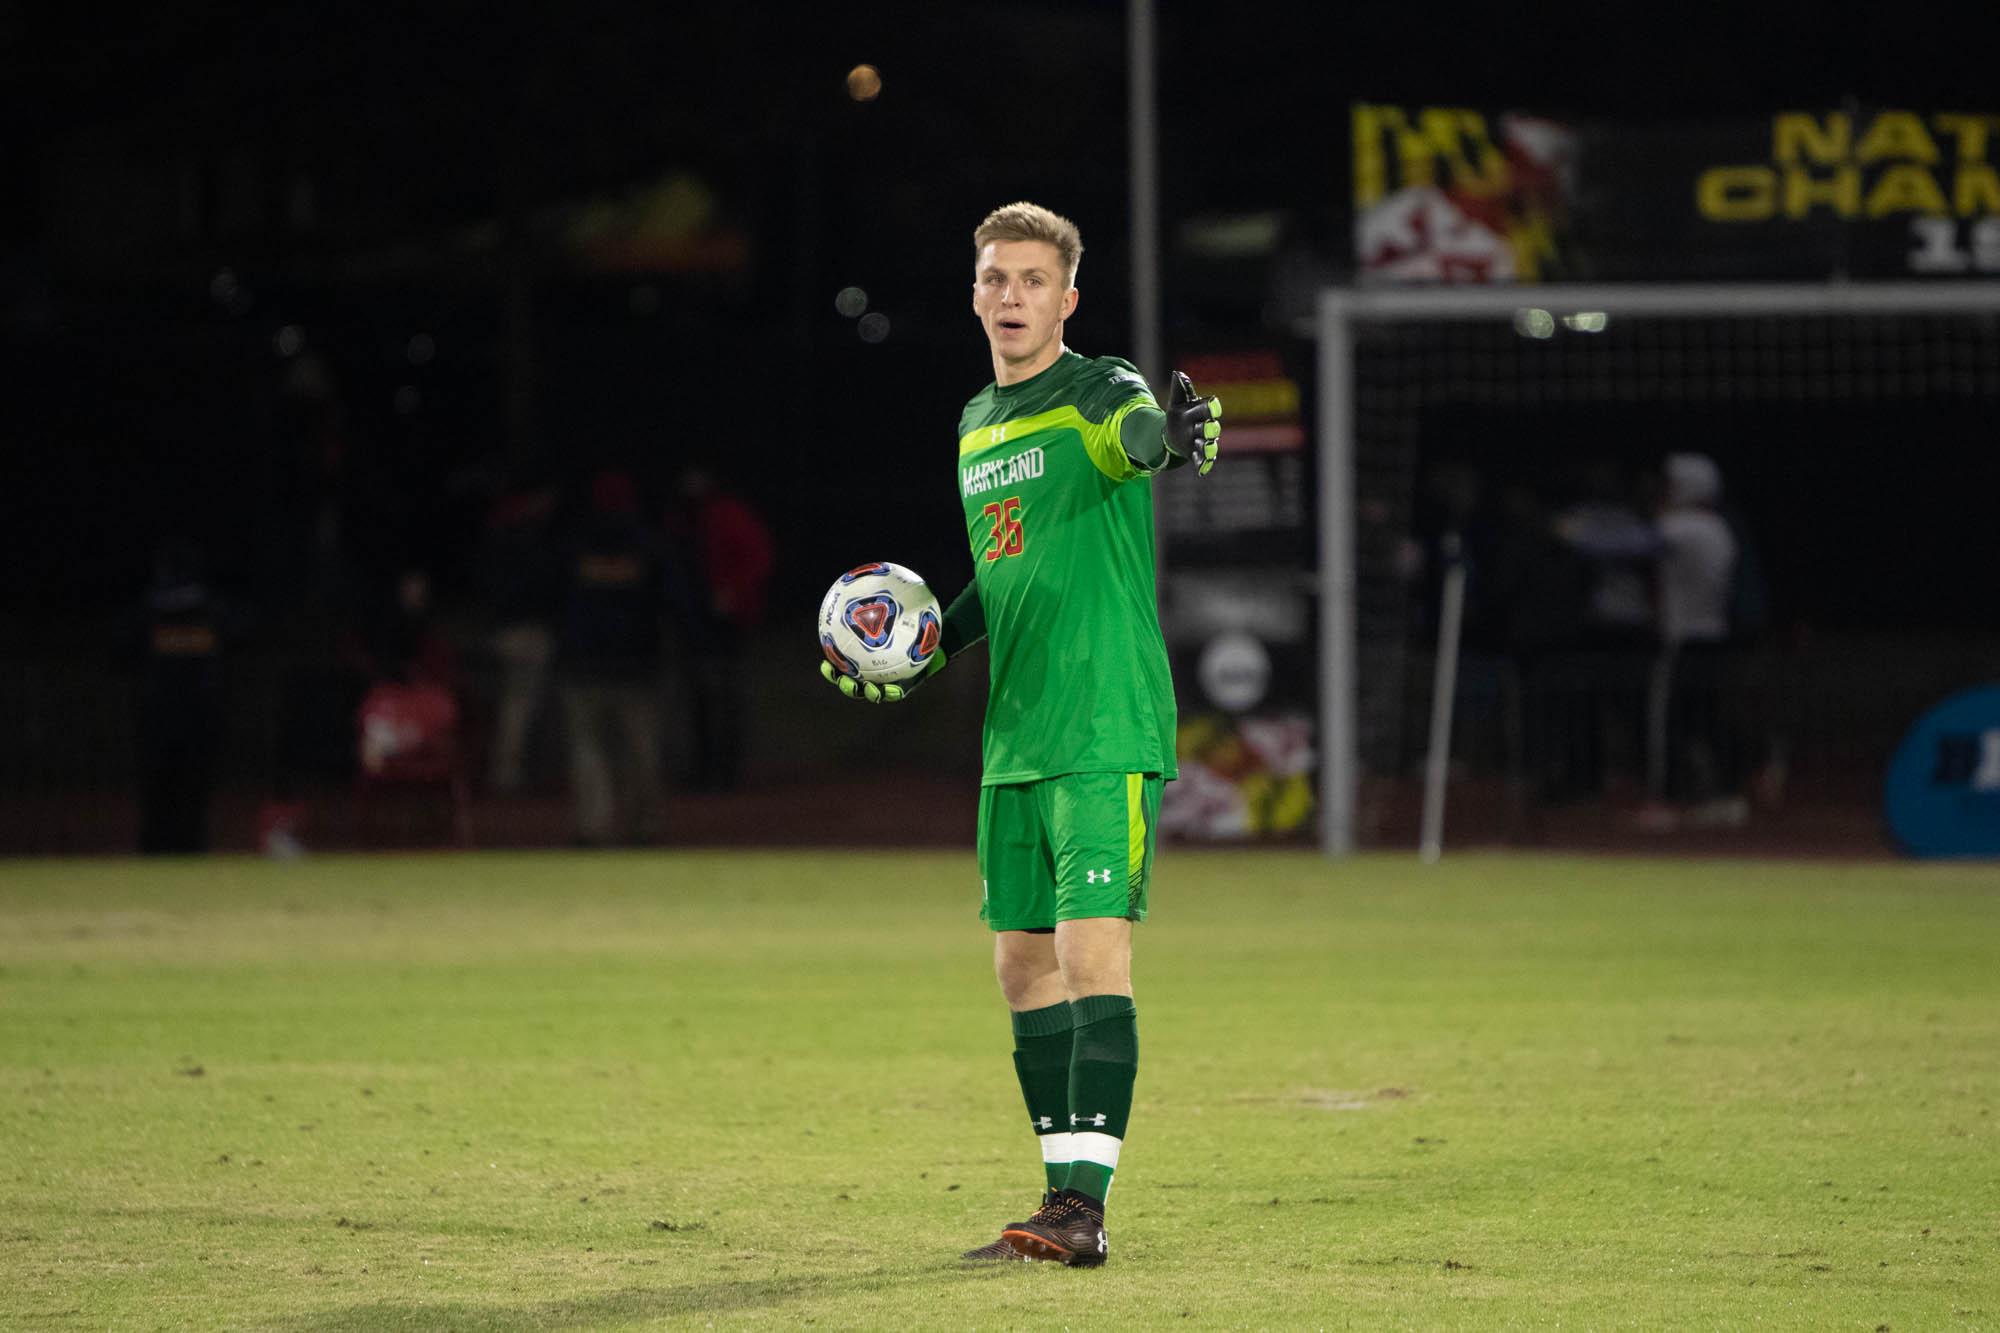 Maryland soccer goalie Niklas Neumann signs contract with German side KSV Hessen Kassel - The Diamondback